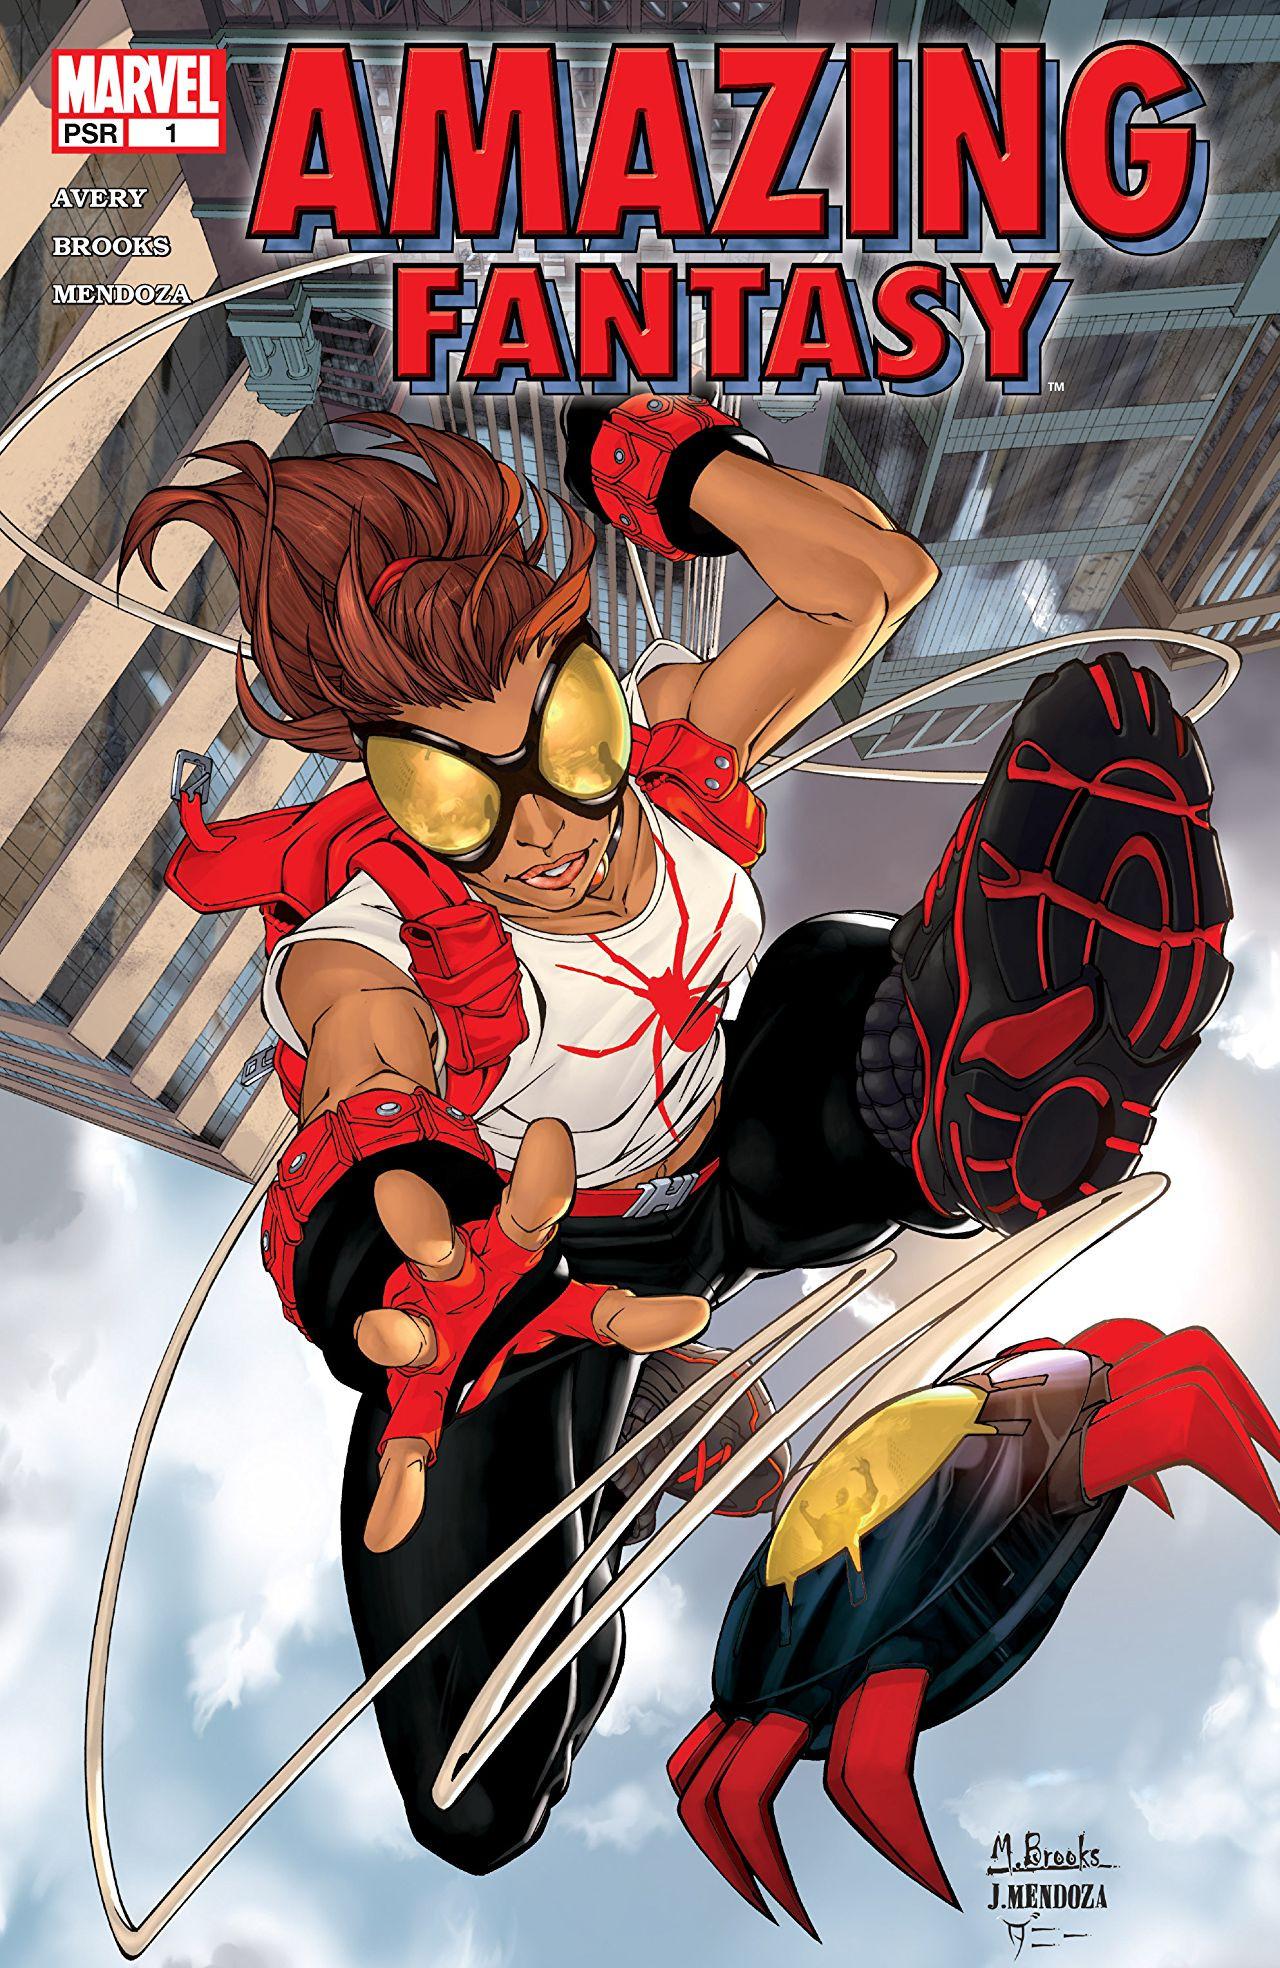 Issue 16 Marvel Comics Amazing Fantasy Spider-Man!